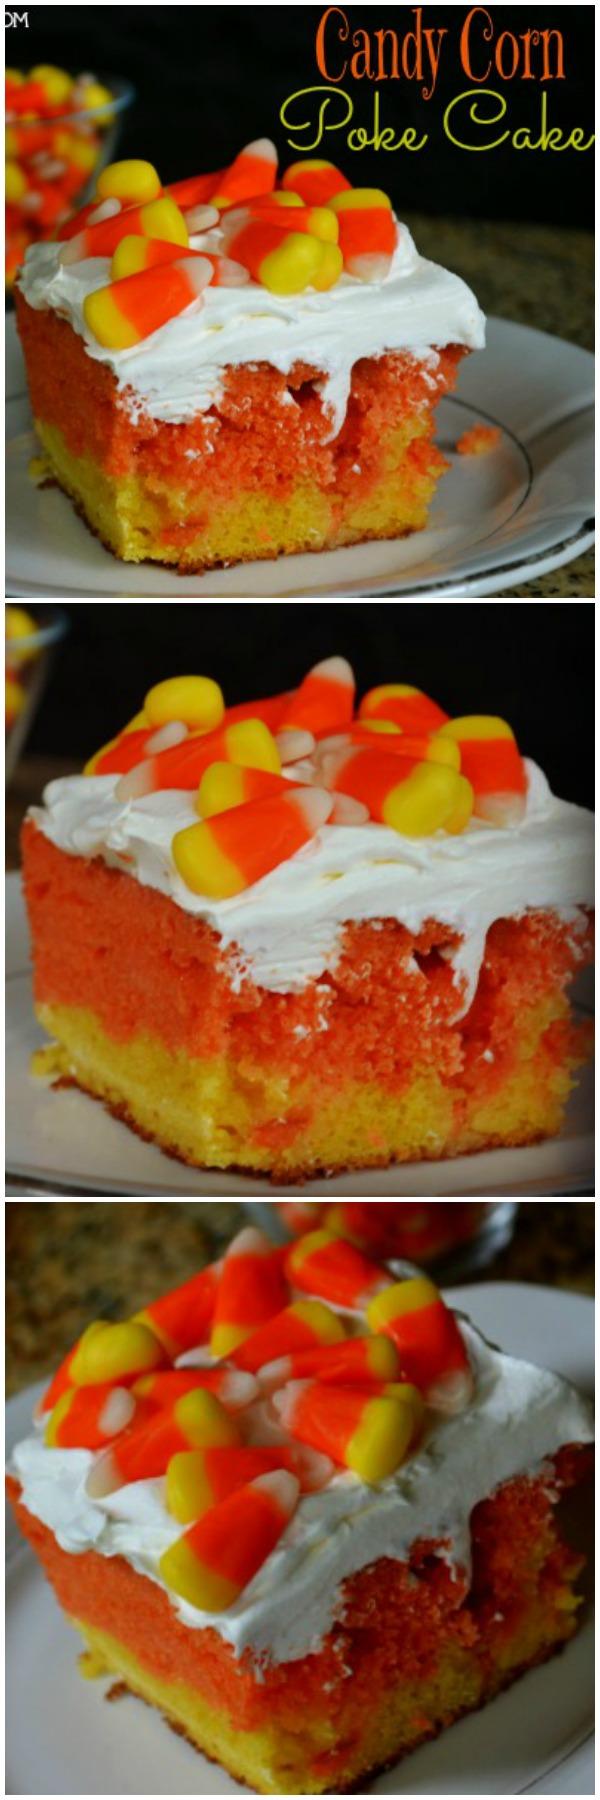 Easy Candy Corn Poke Cake | MrsHappyHomemaker.com @MrsHappyHomemaker #candycornpokecake #candycorn #pokecake #falldessert #fall